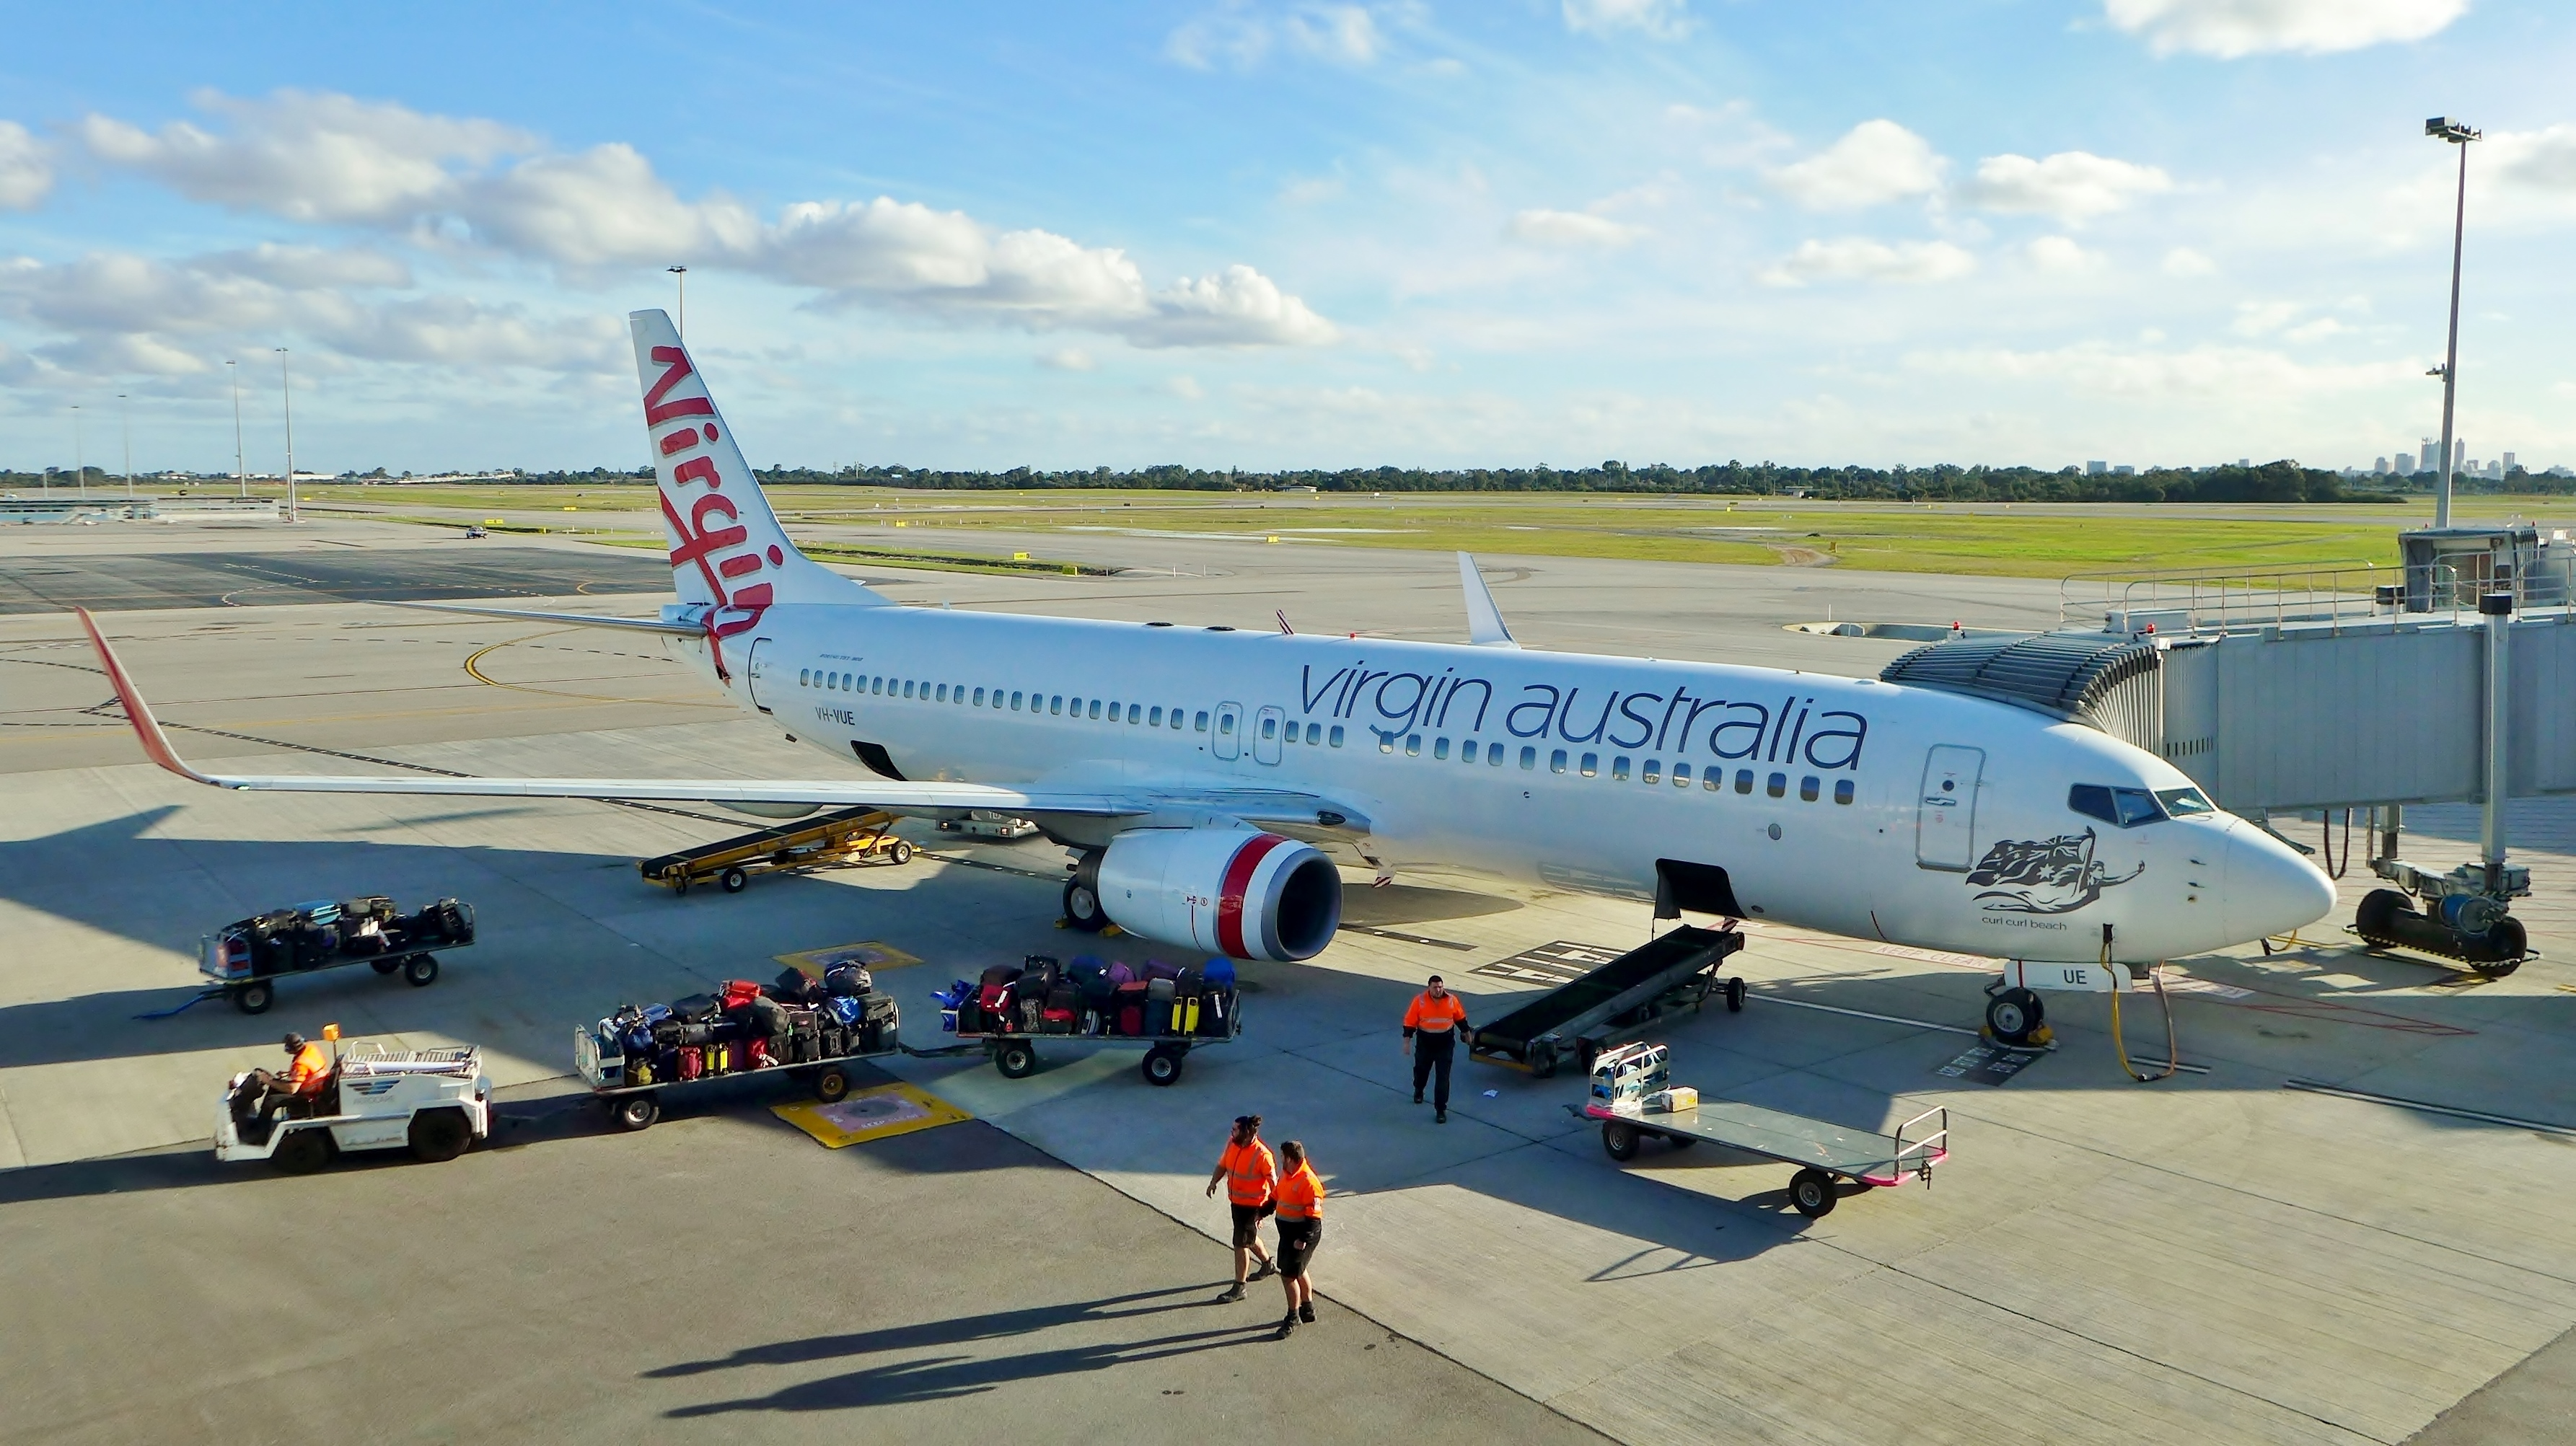 File:Virgin Australia VH-VUE Perth 2017.jpg - Wikimedia Commons